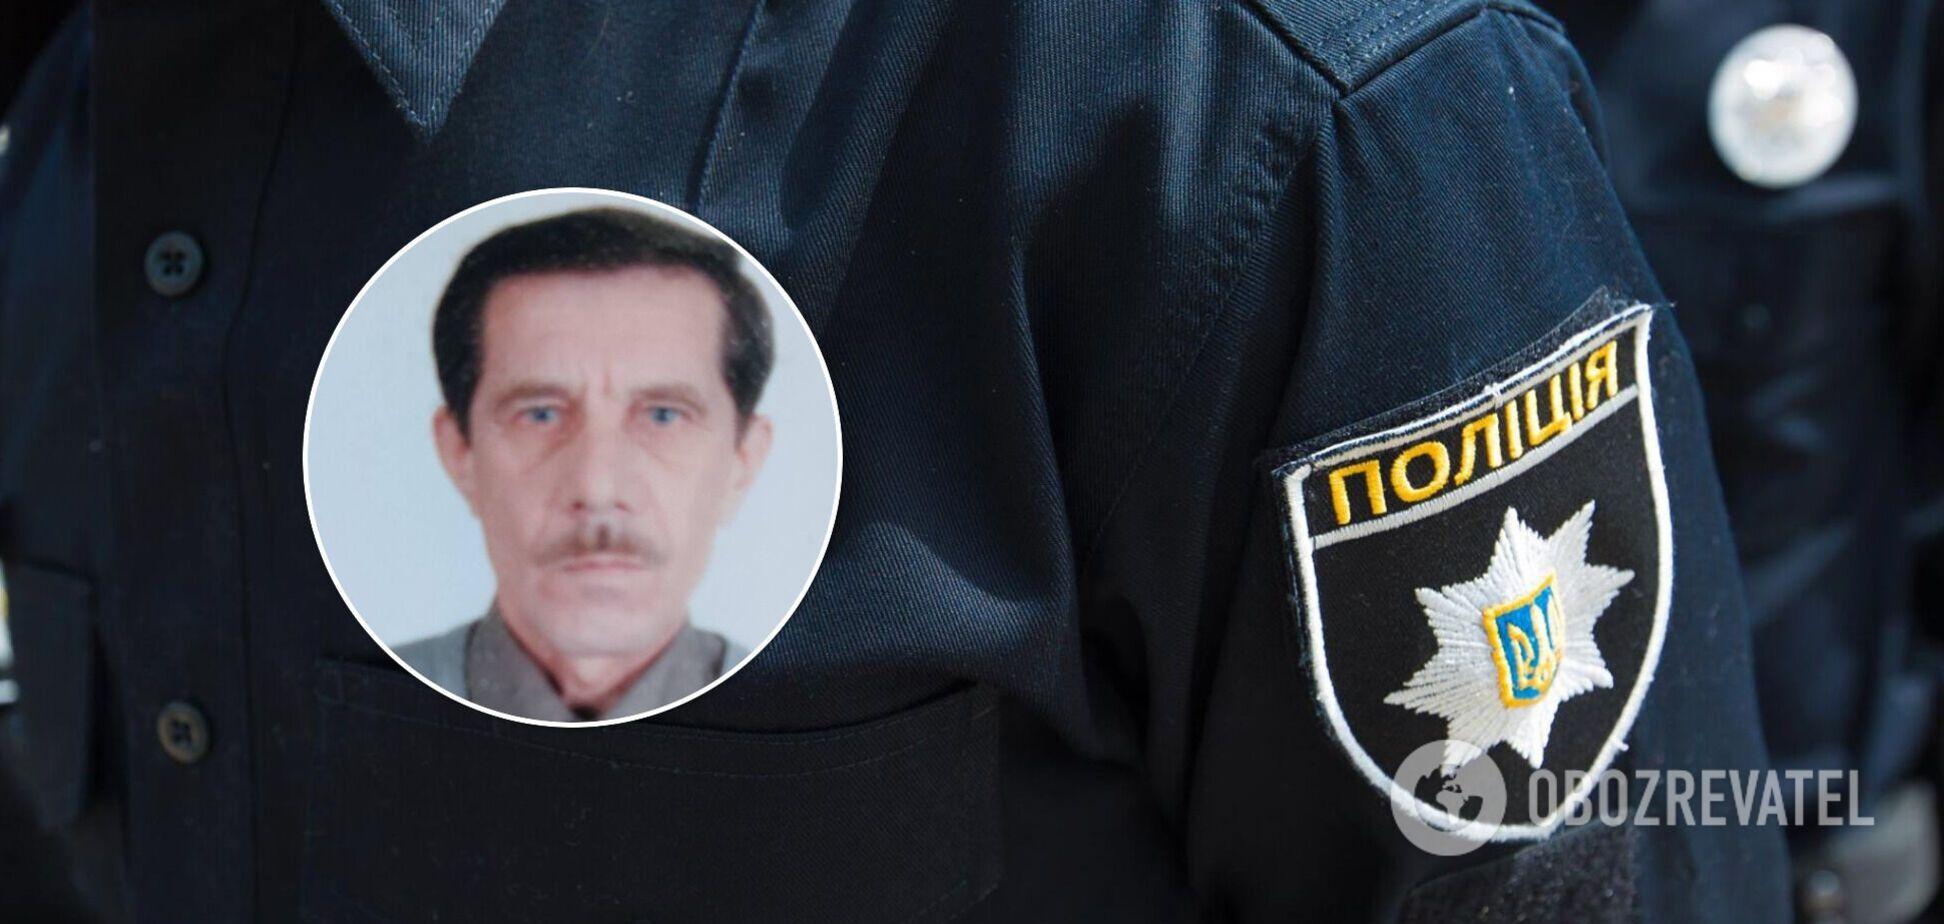 Под Киевом загадочно пропал мужчина, накануне ему стало плохо. Фото